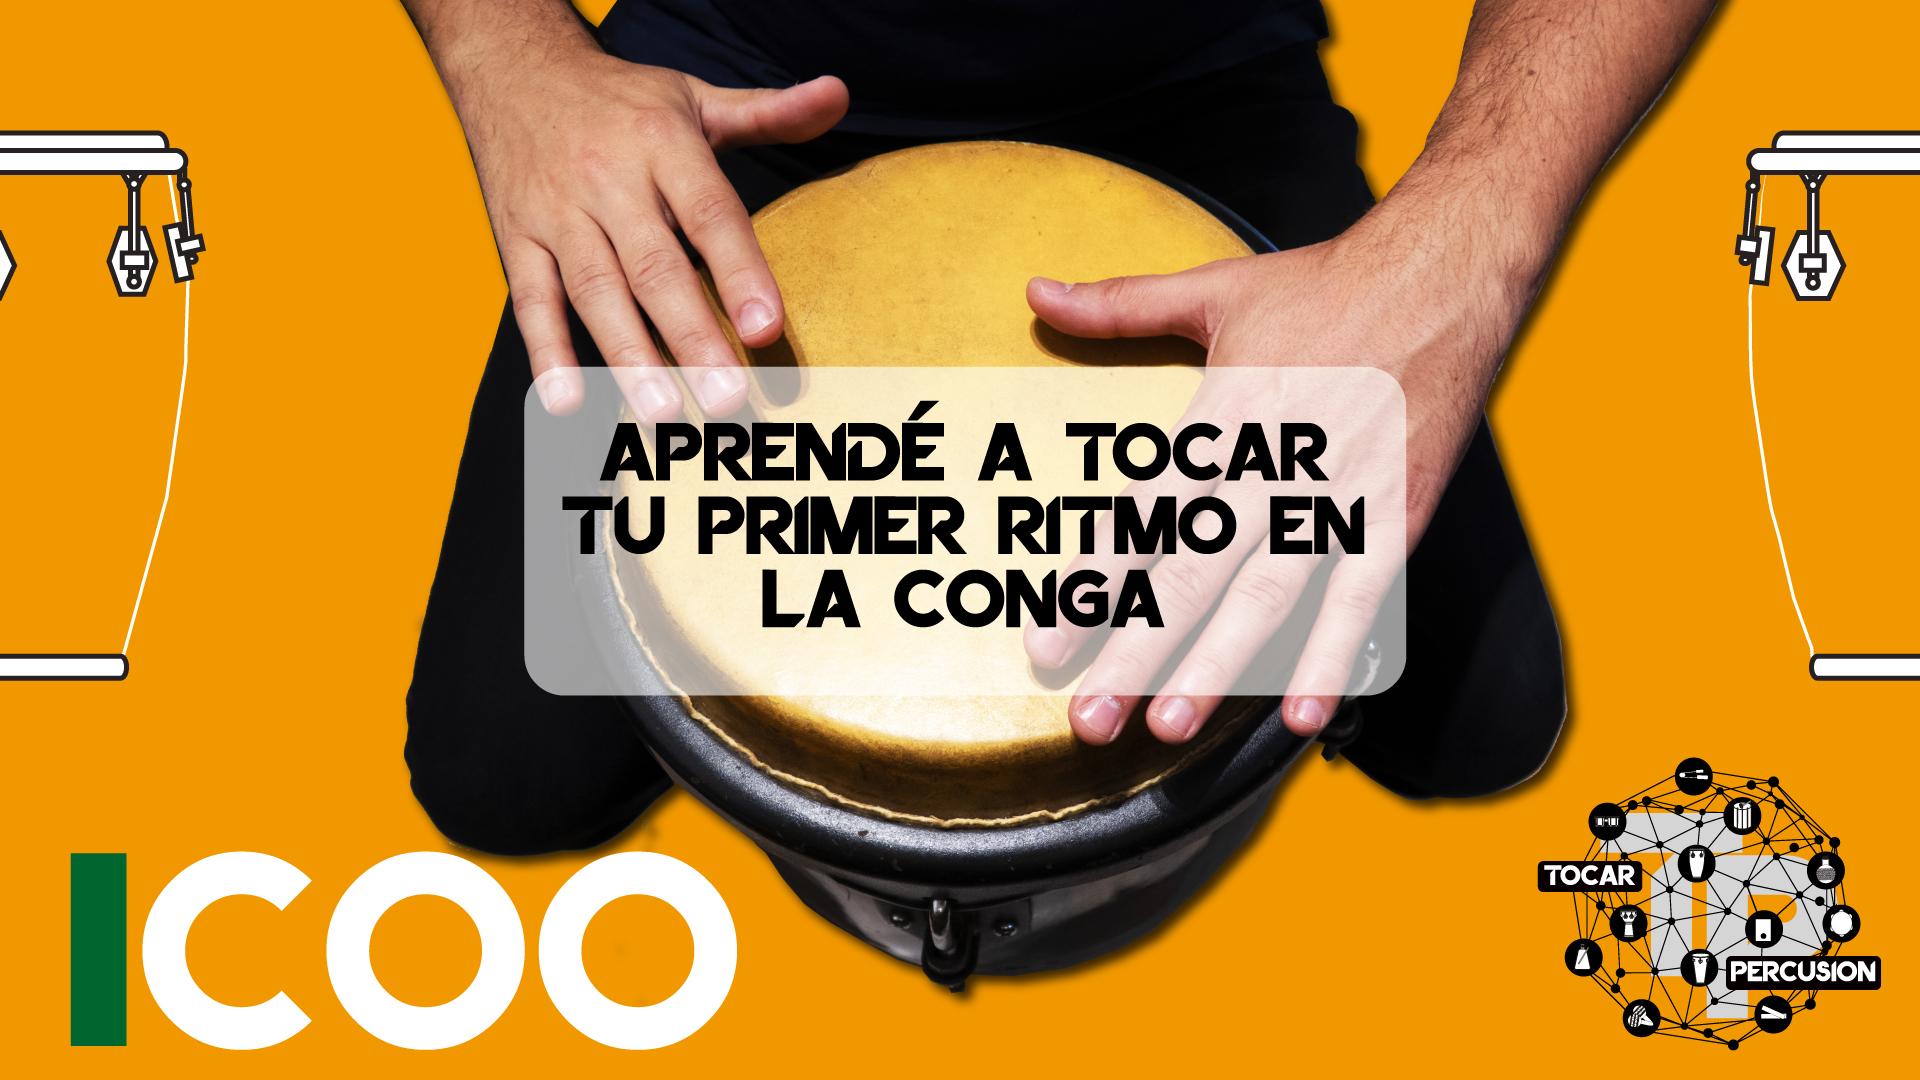 Tocar-Cursos-Online-de-Percusion-Conga